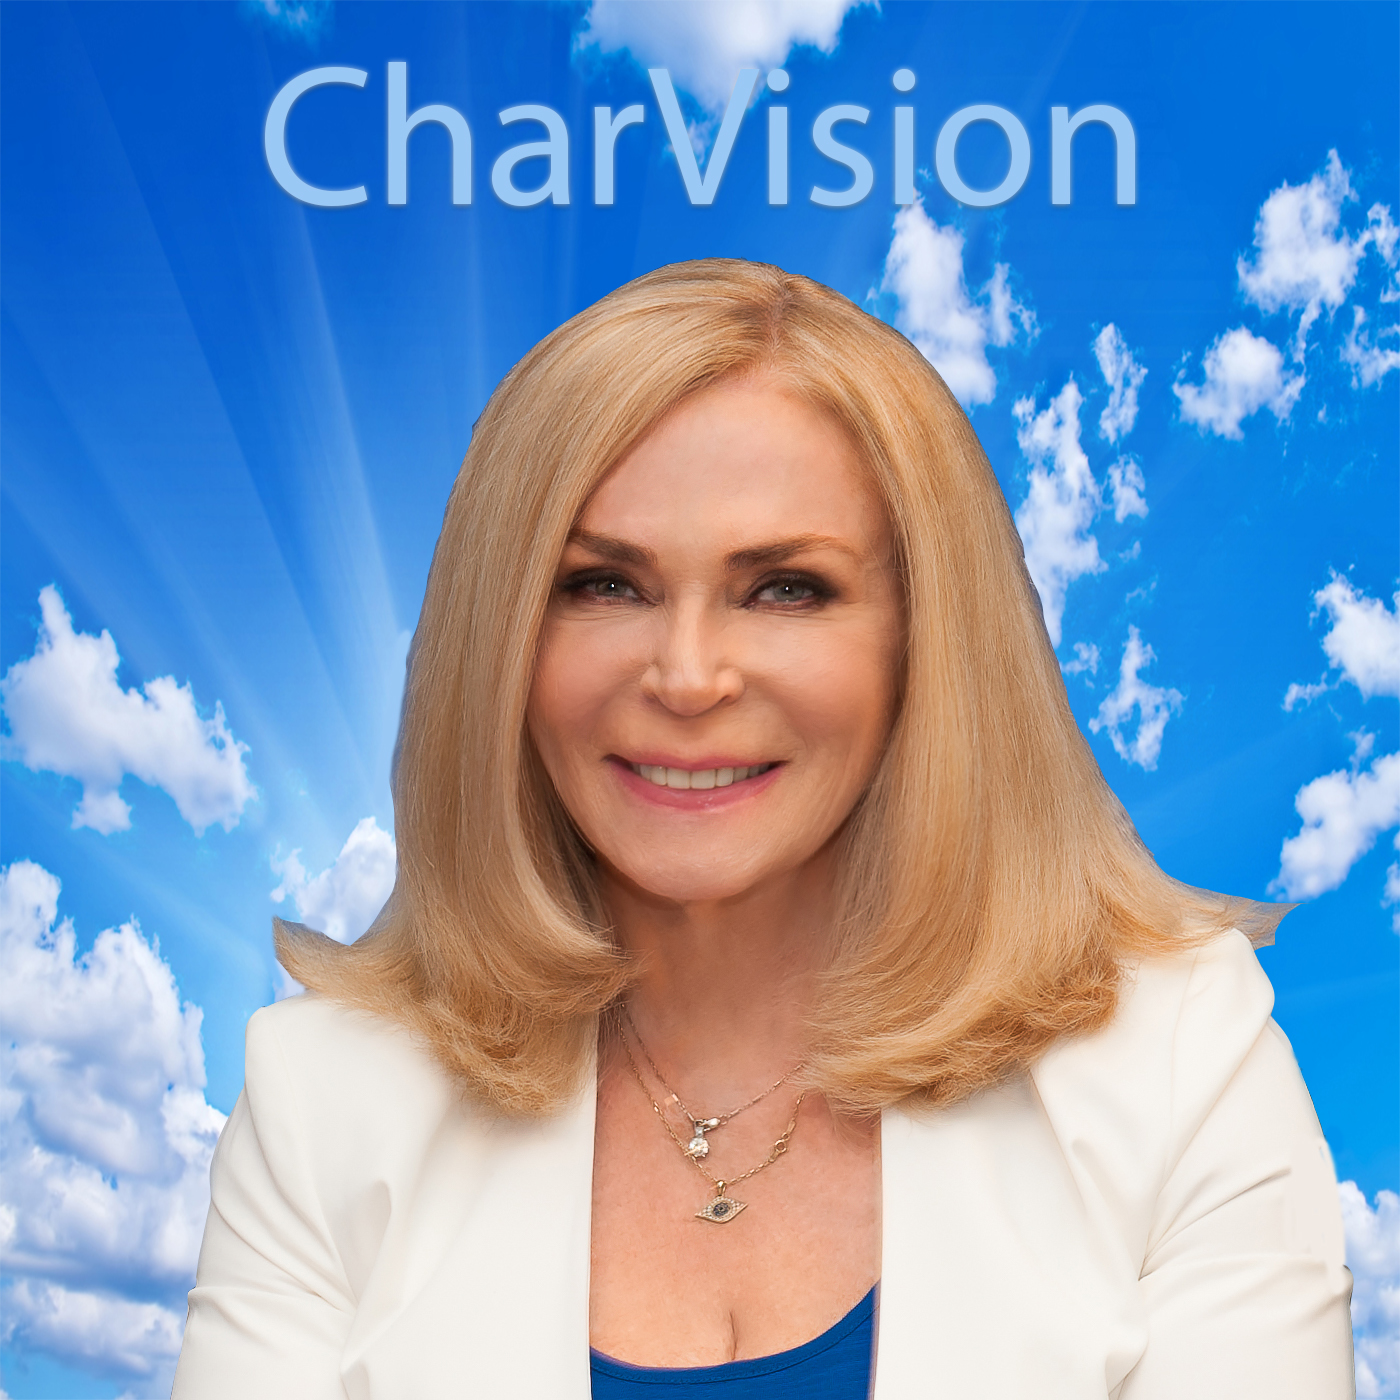 <![CDATA[CharVision]]>